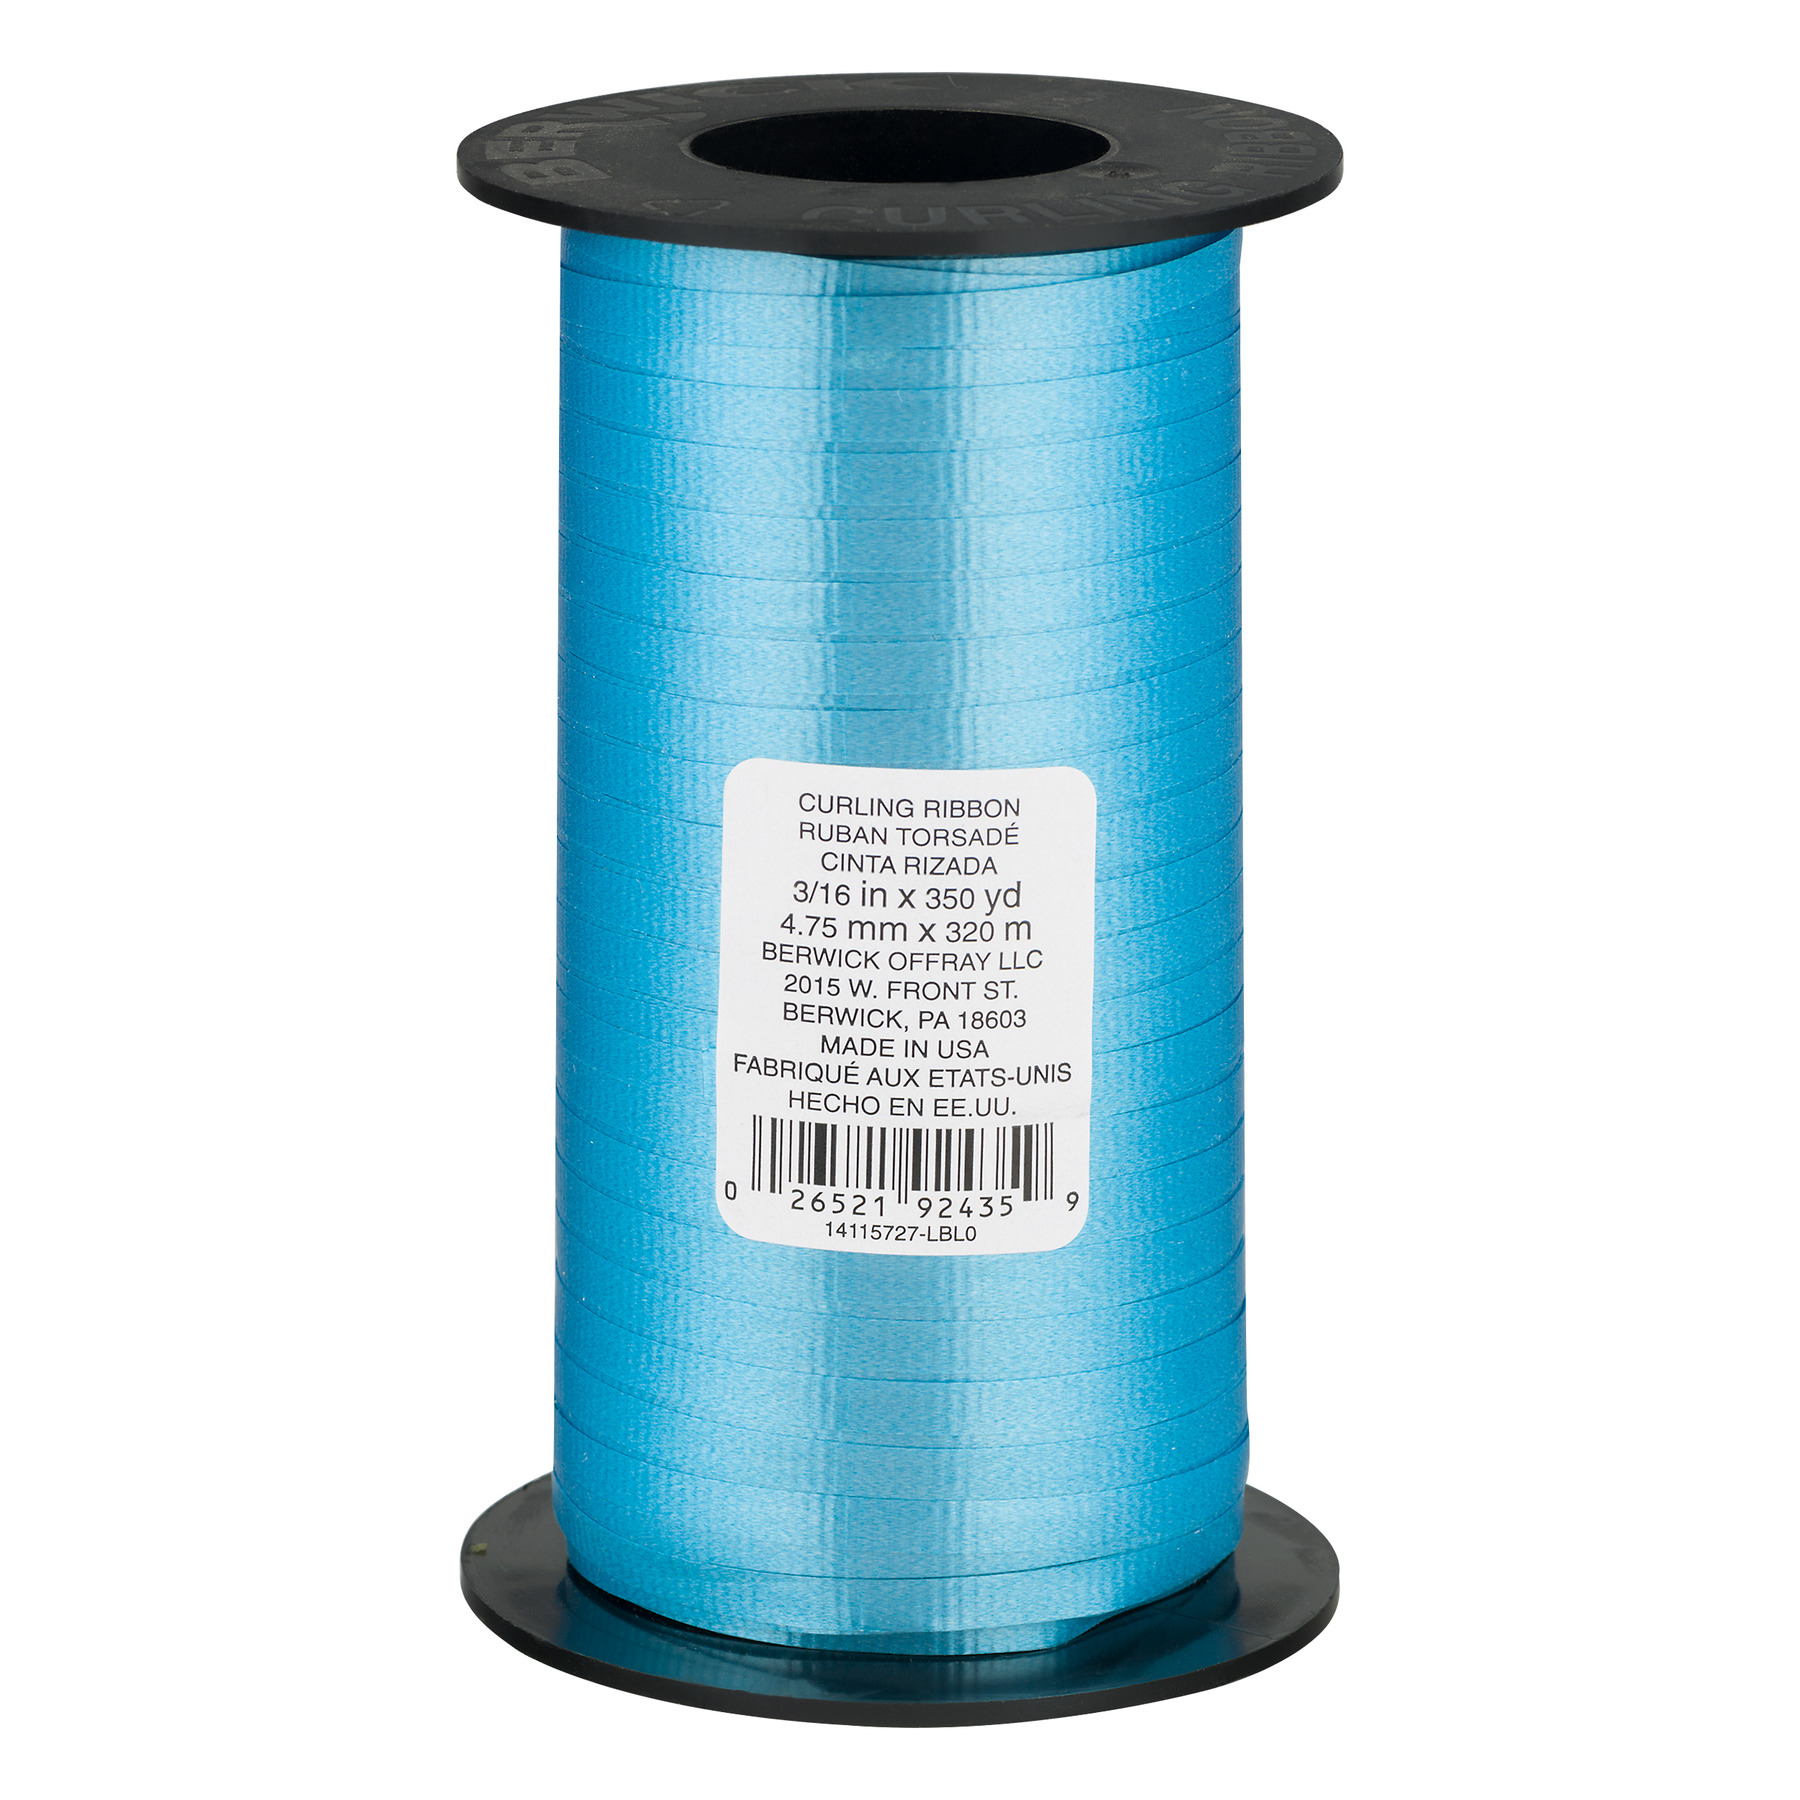 Berwick Curling Ribbon Light Blue - 350 Yards, 350.0 YARDS